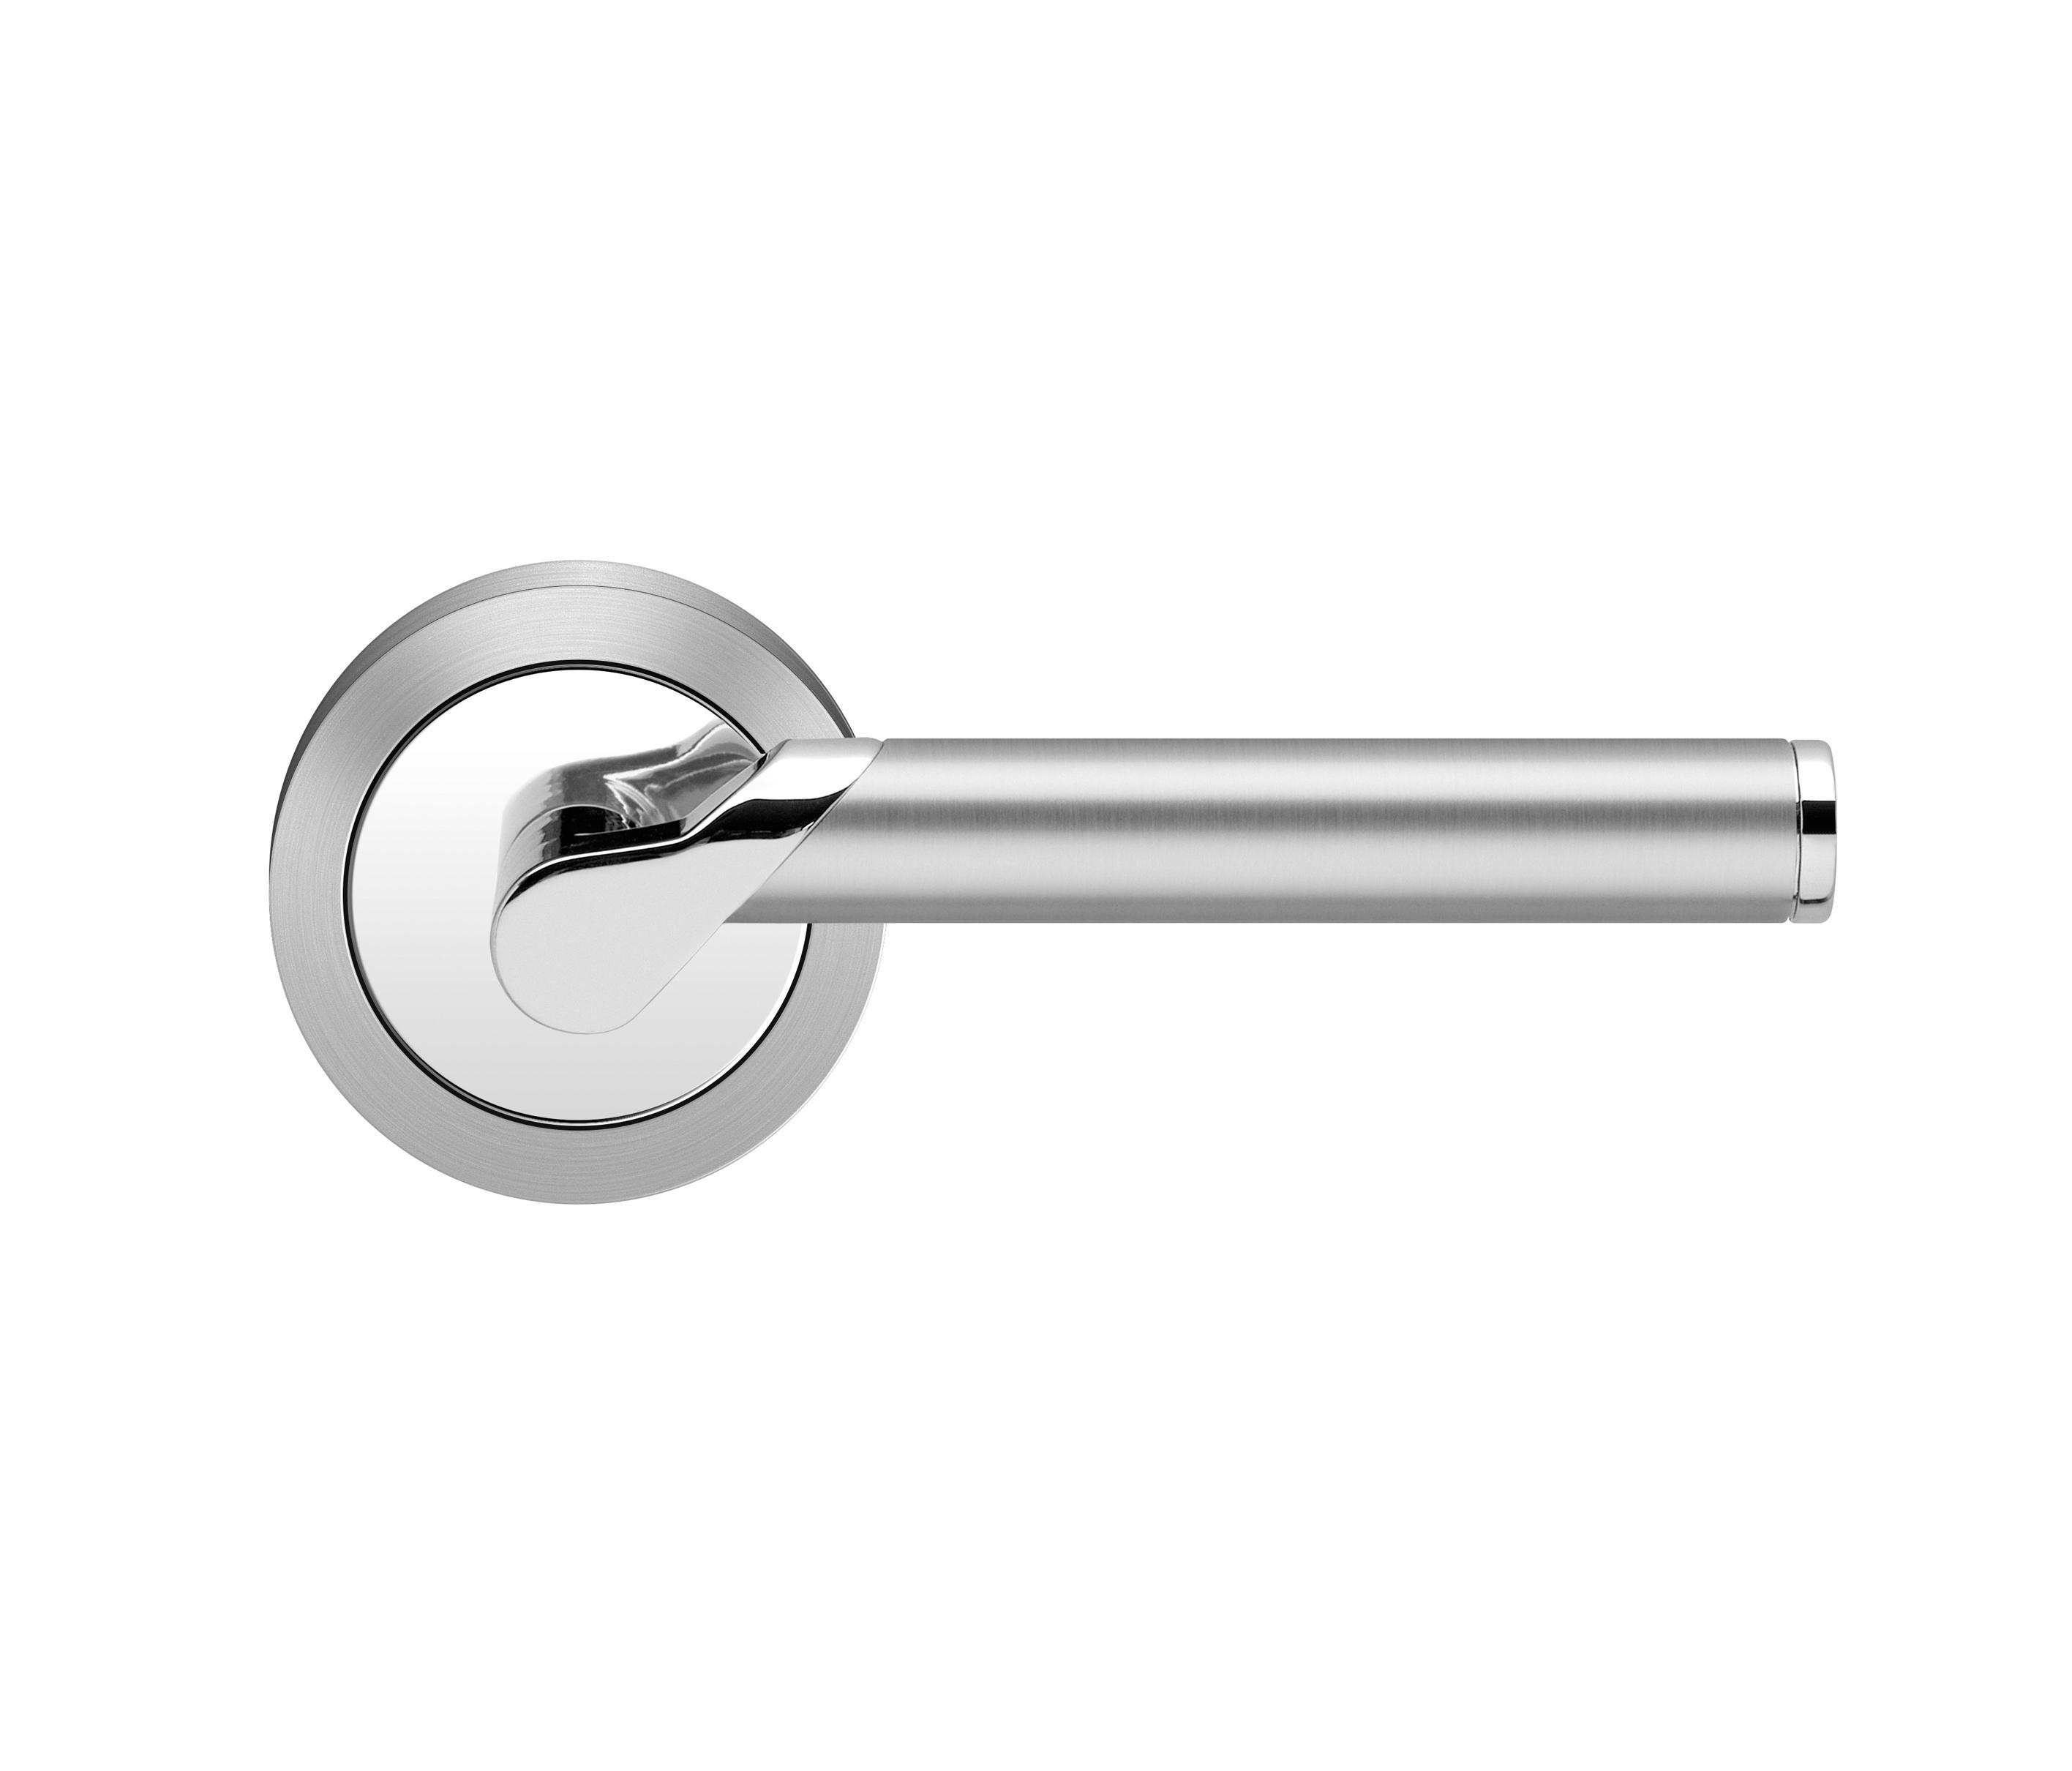 starlight ur38 65 lever handles from karcher design architonic